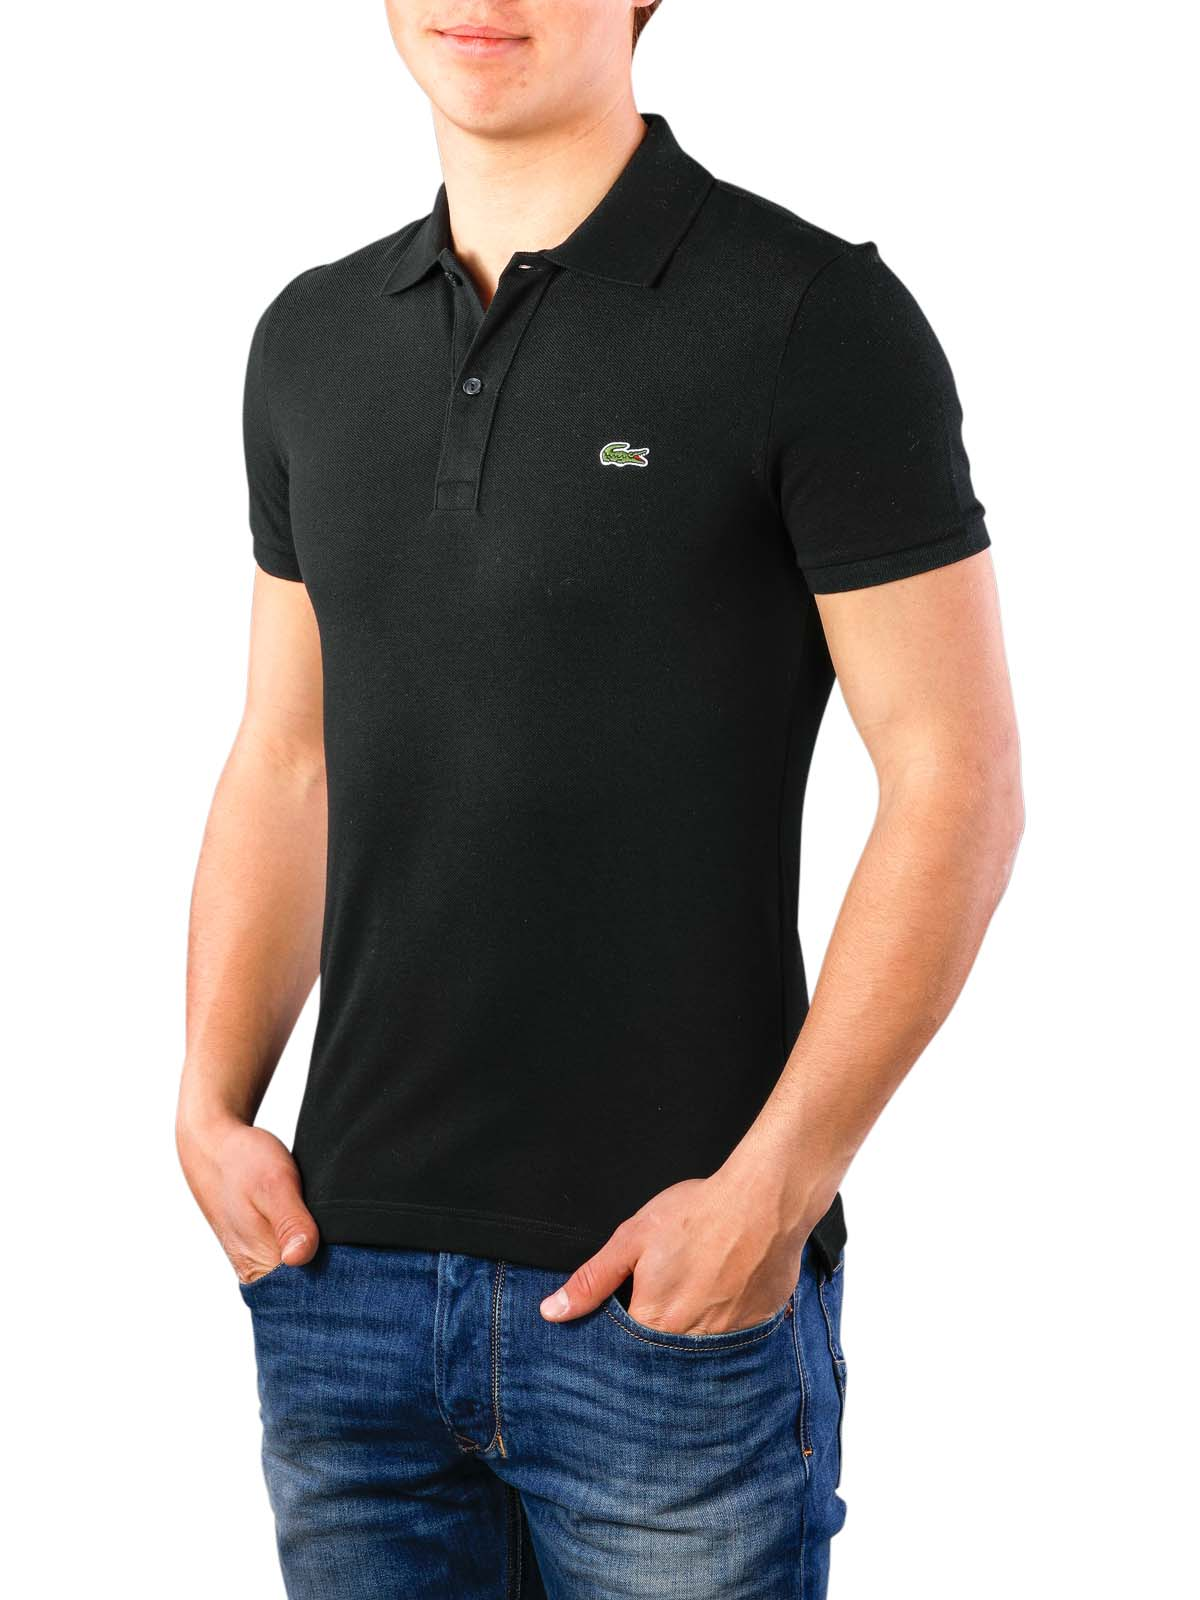 dd5e2ed66e McJeans.ch - envoi immédiat | Lacoste Polo Shirt Slim Short Sleeves ...